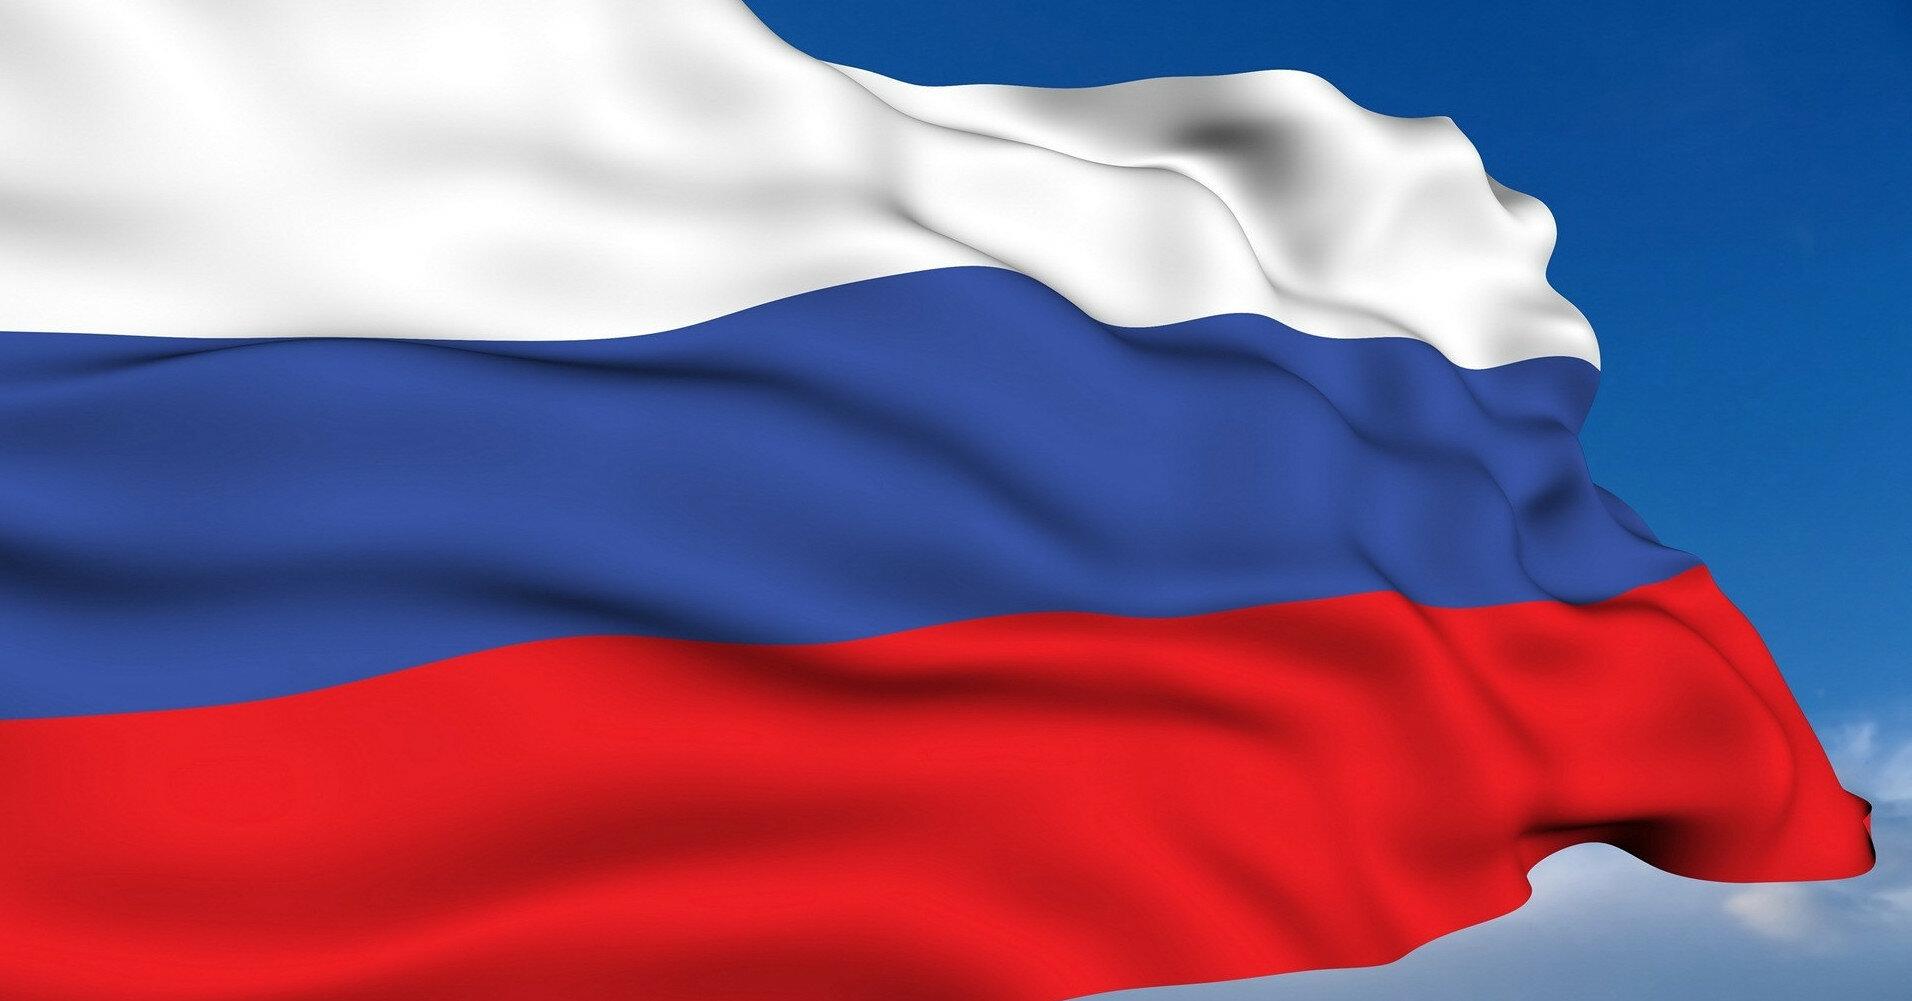 РФ проводит учения в акватории Черного моря